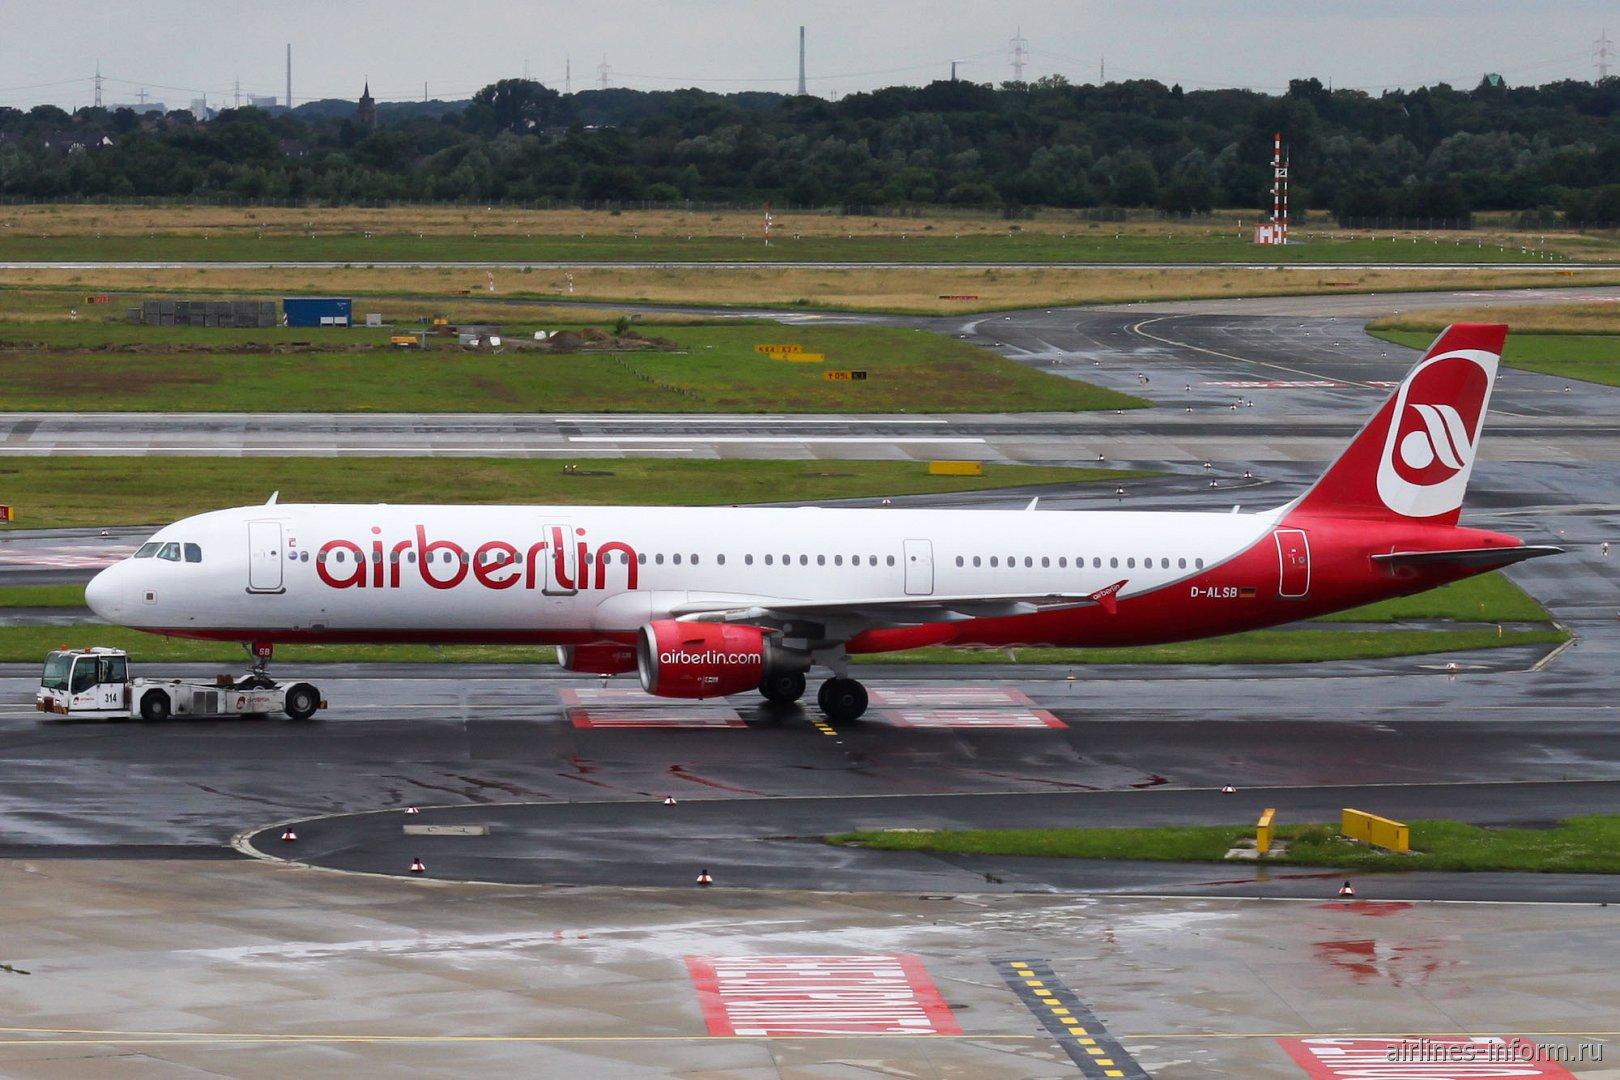 Airbus A321 авиакомпании airberlin в аэропорту Дюссельдорфа